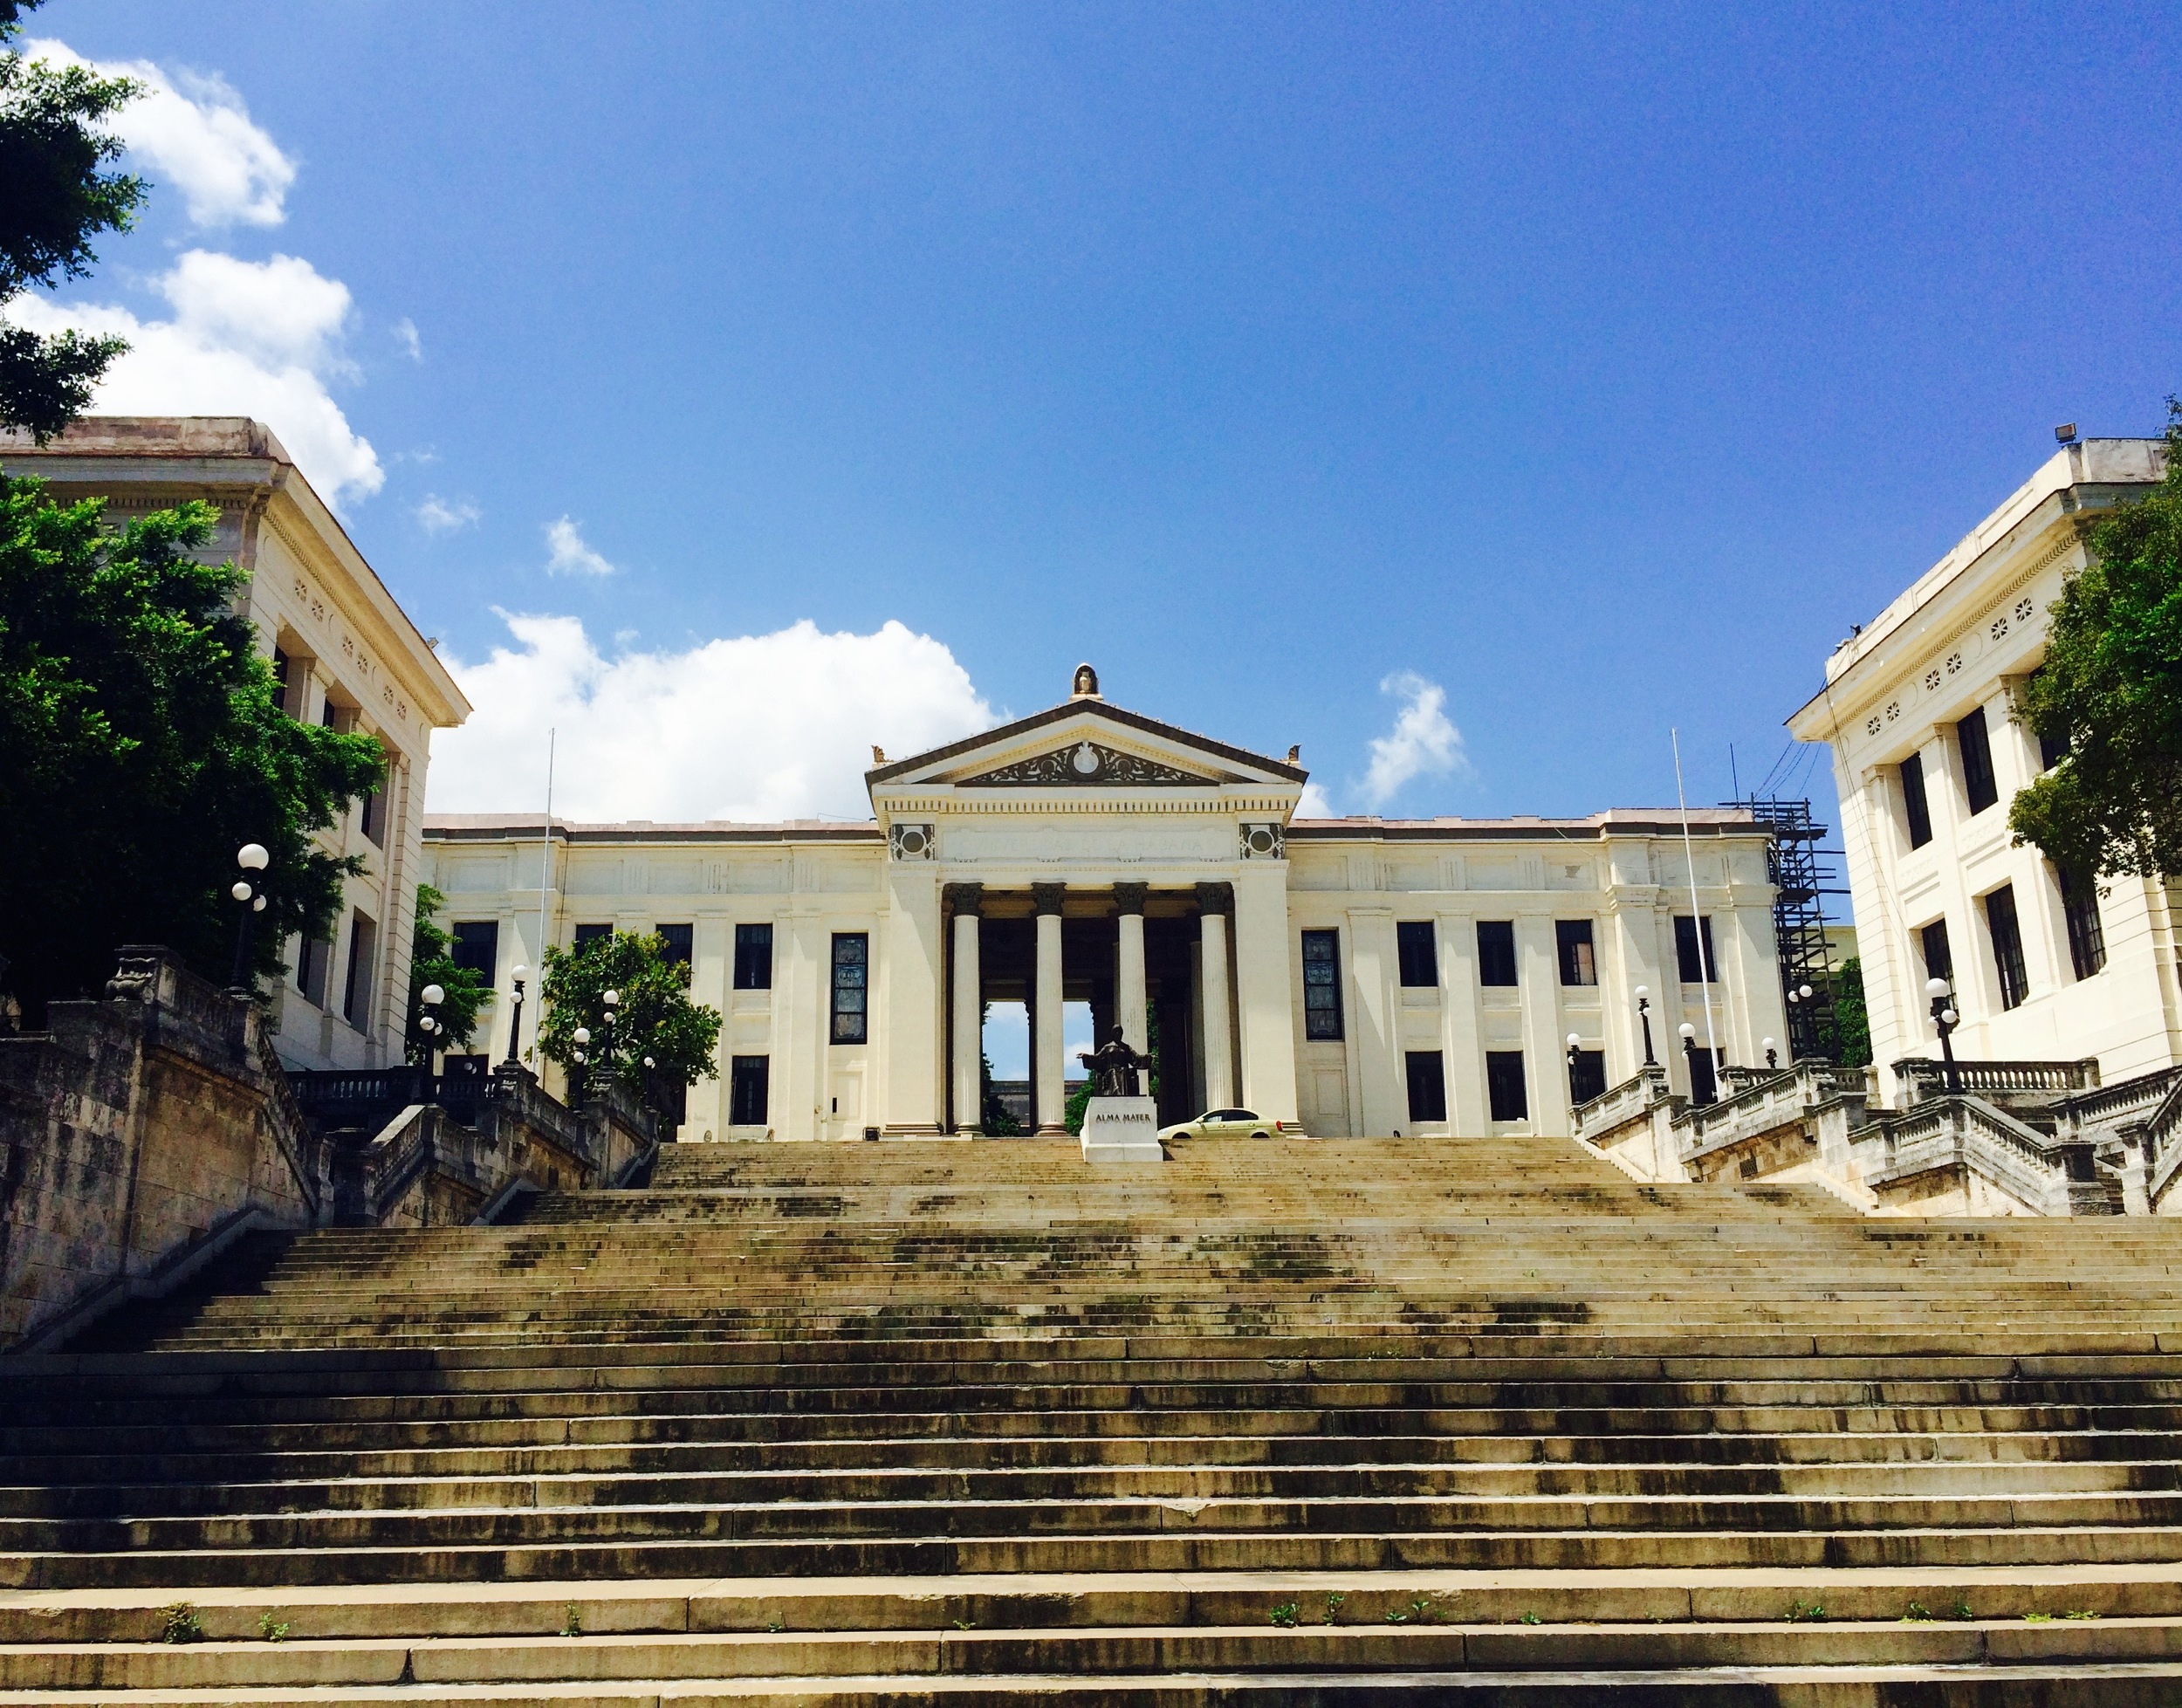 The University of Havana